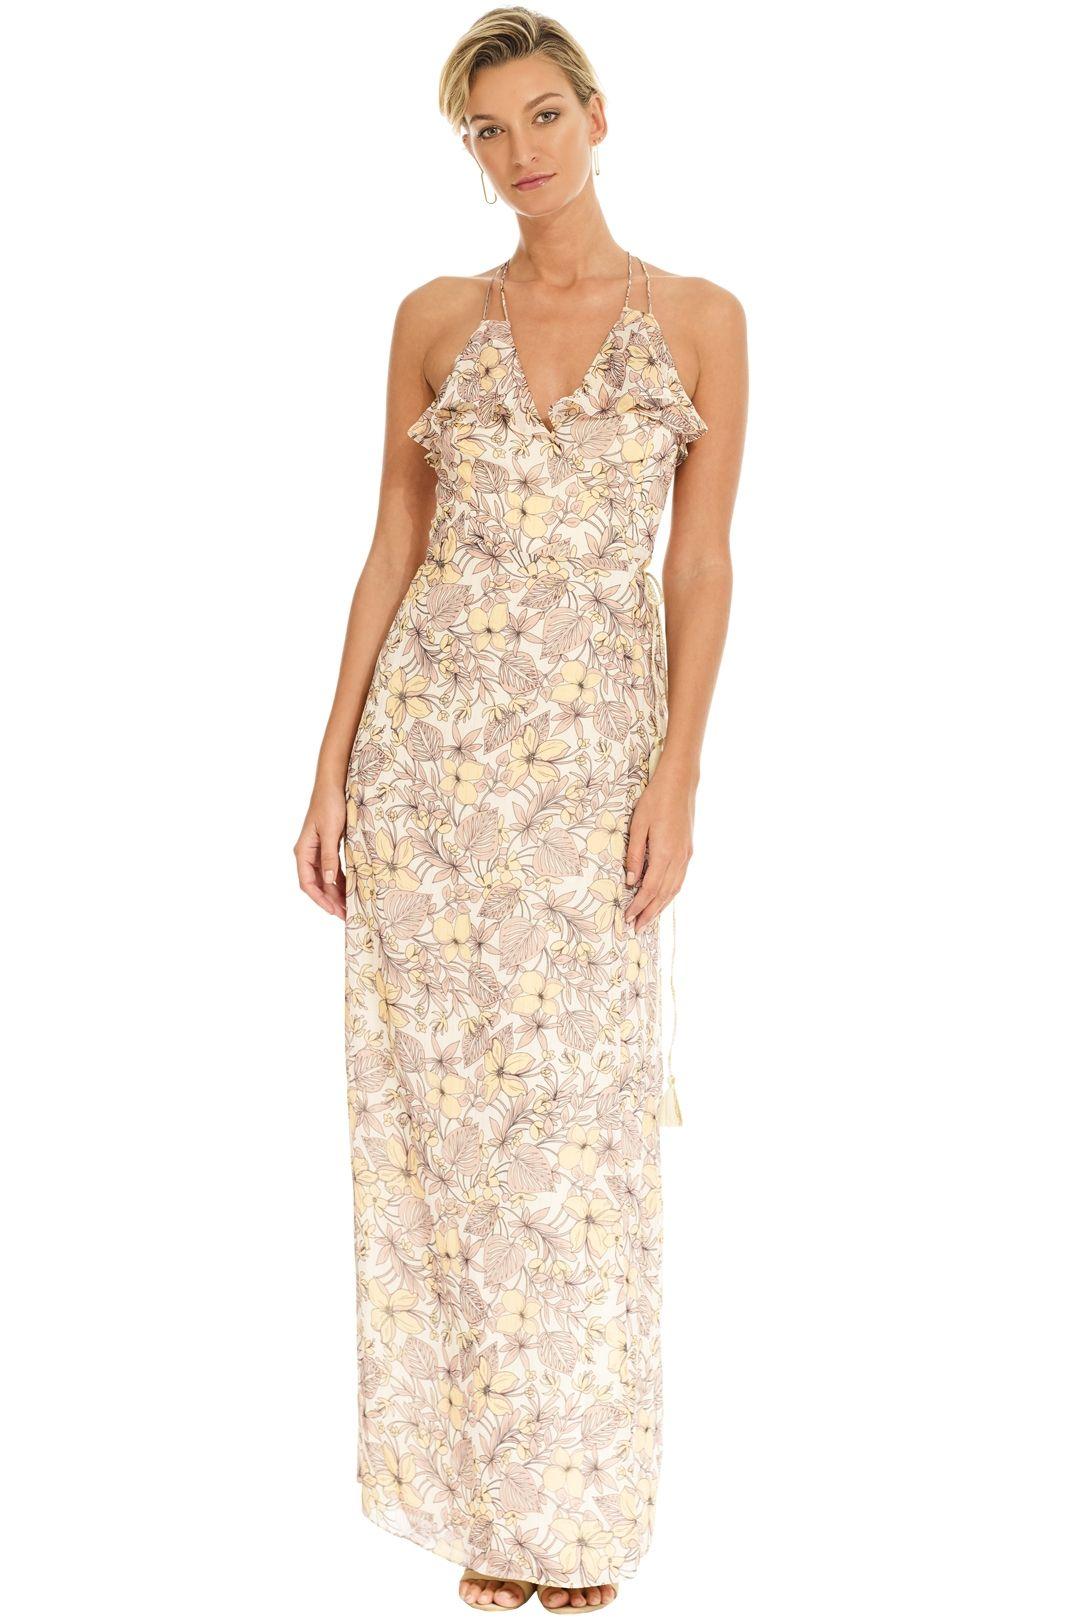 The Jetset Diaries - Frangapani Maxi Dress - Golden Floral - Front